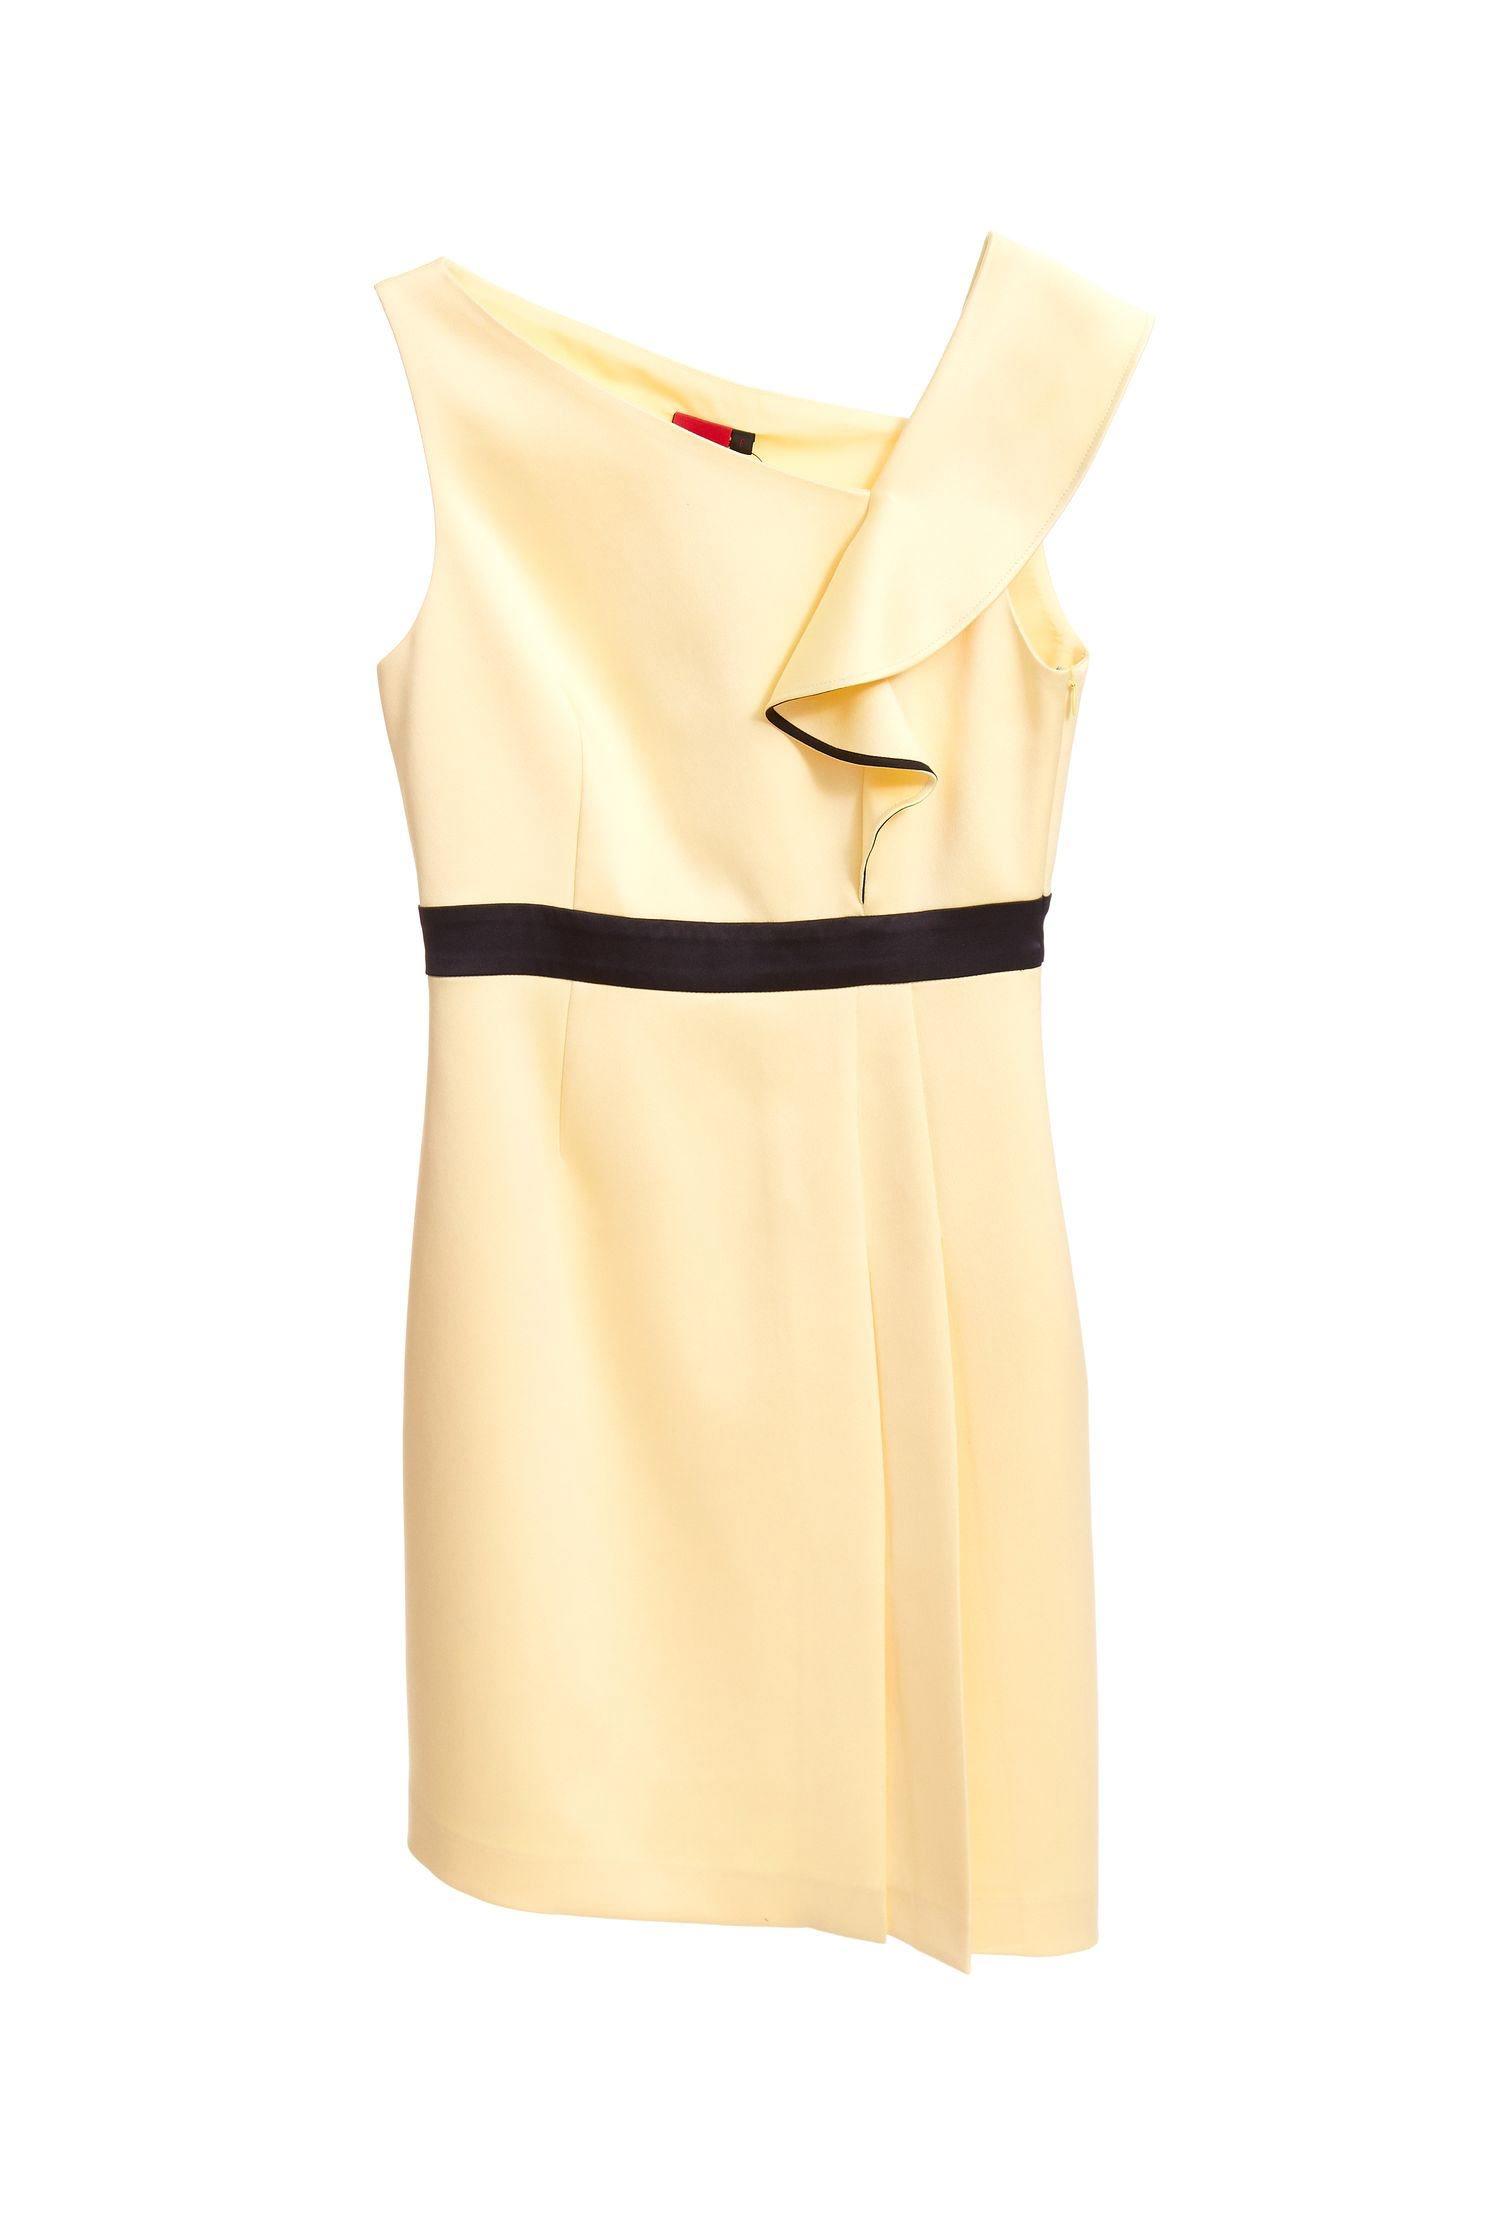 Elegant style dress,cocktaildress,watersigns,sleevelessdress